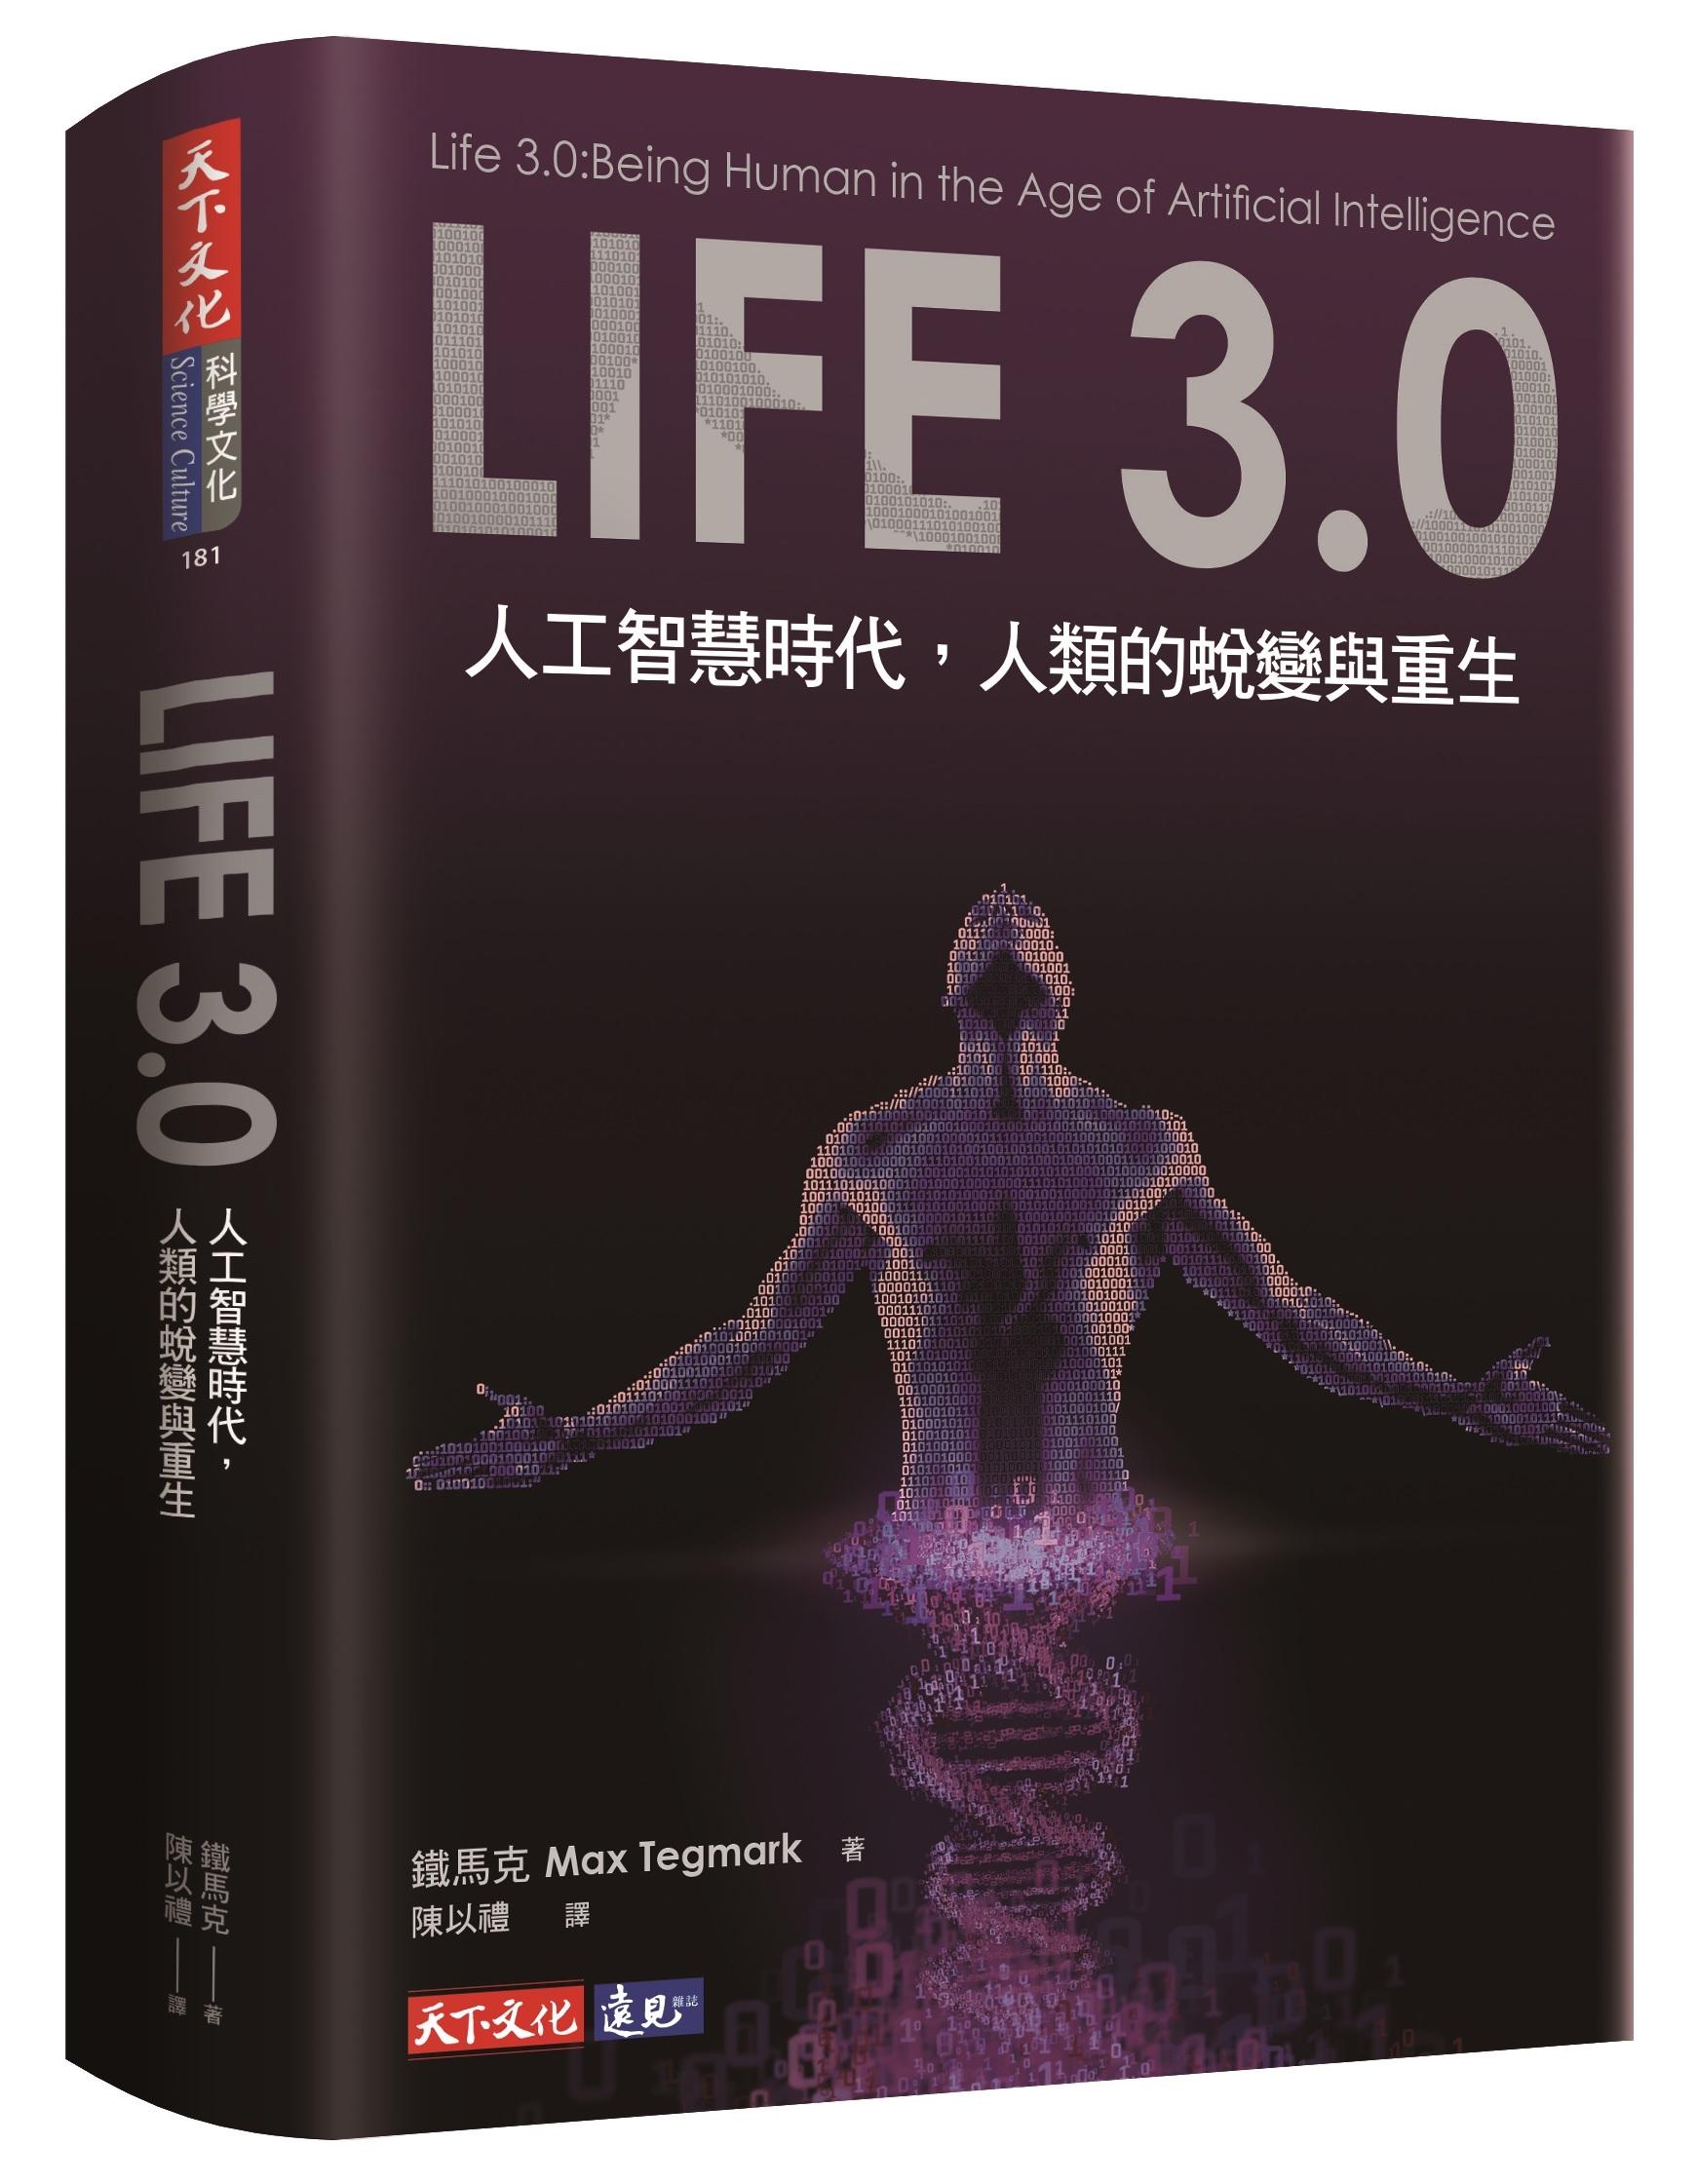 Life 3.0